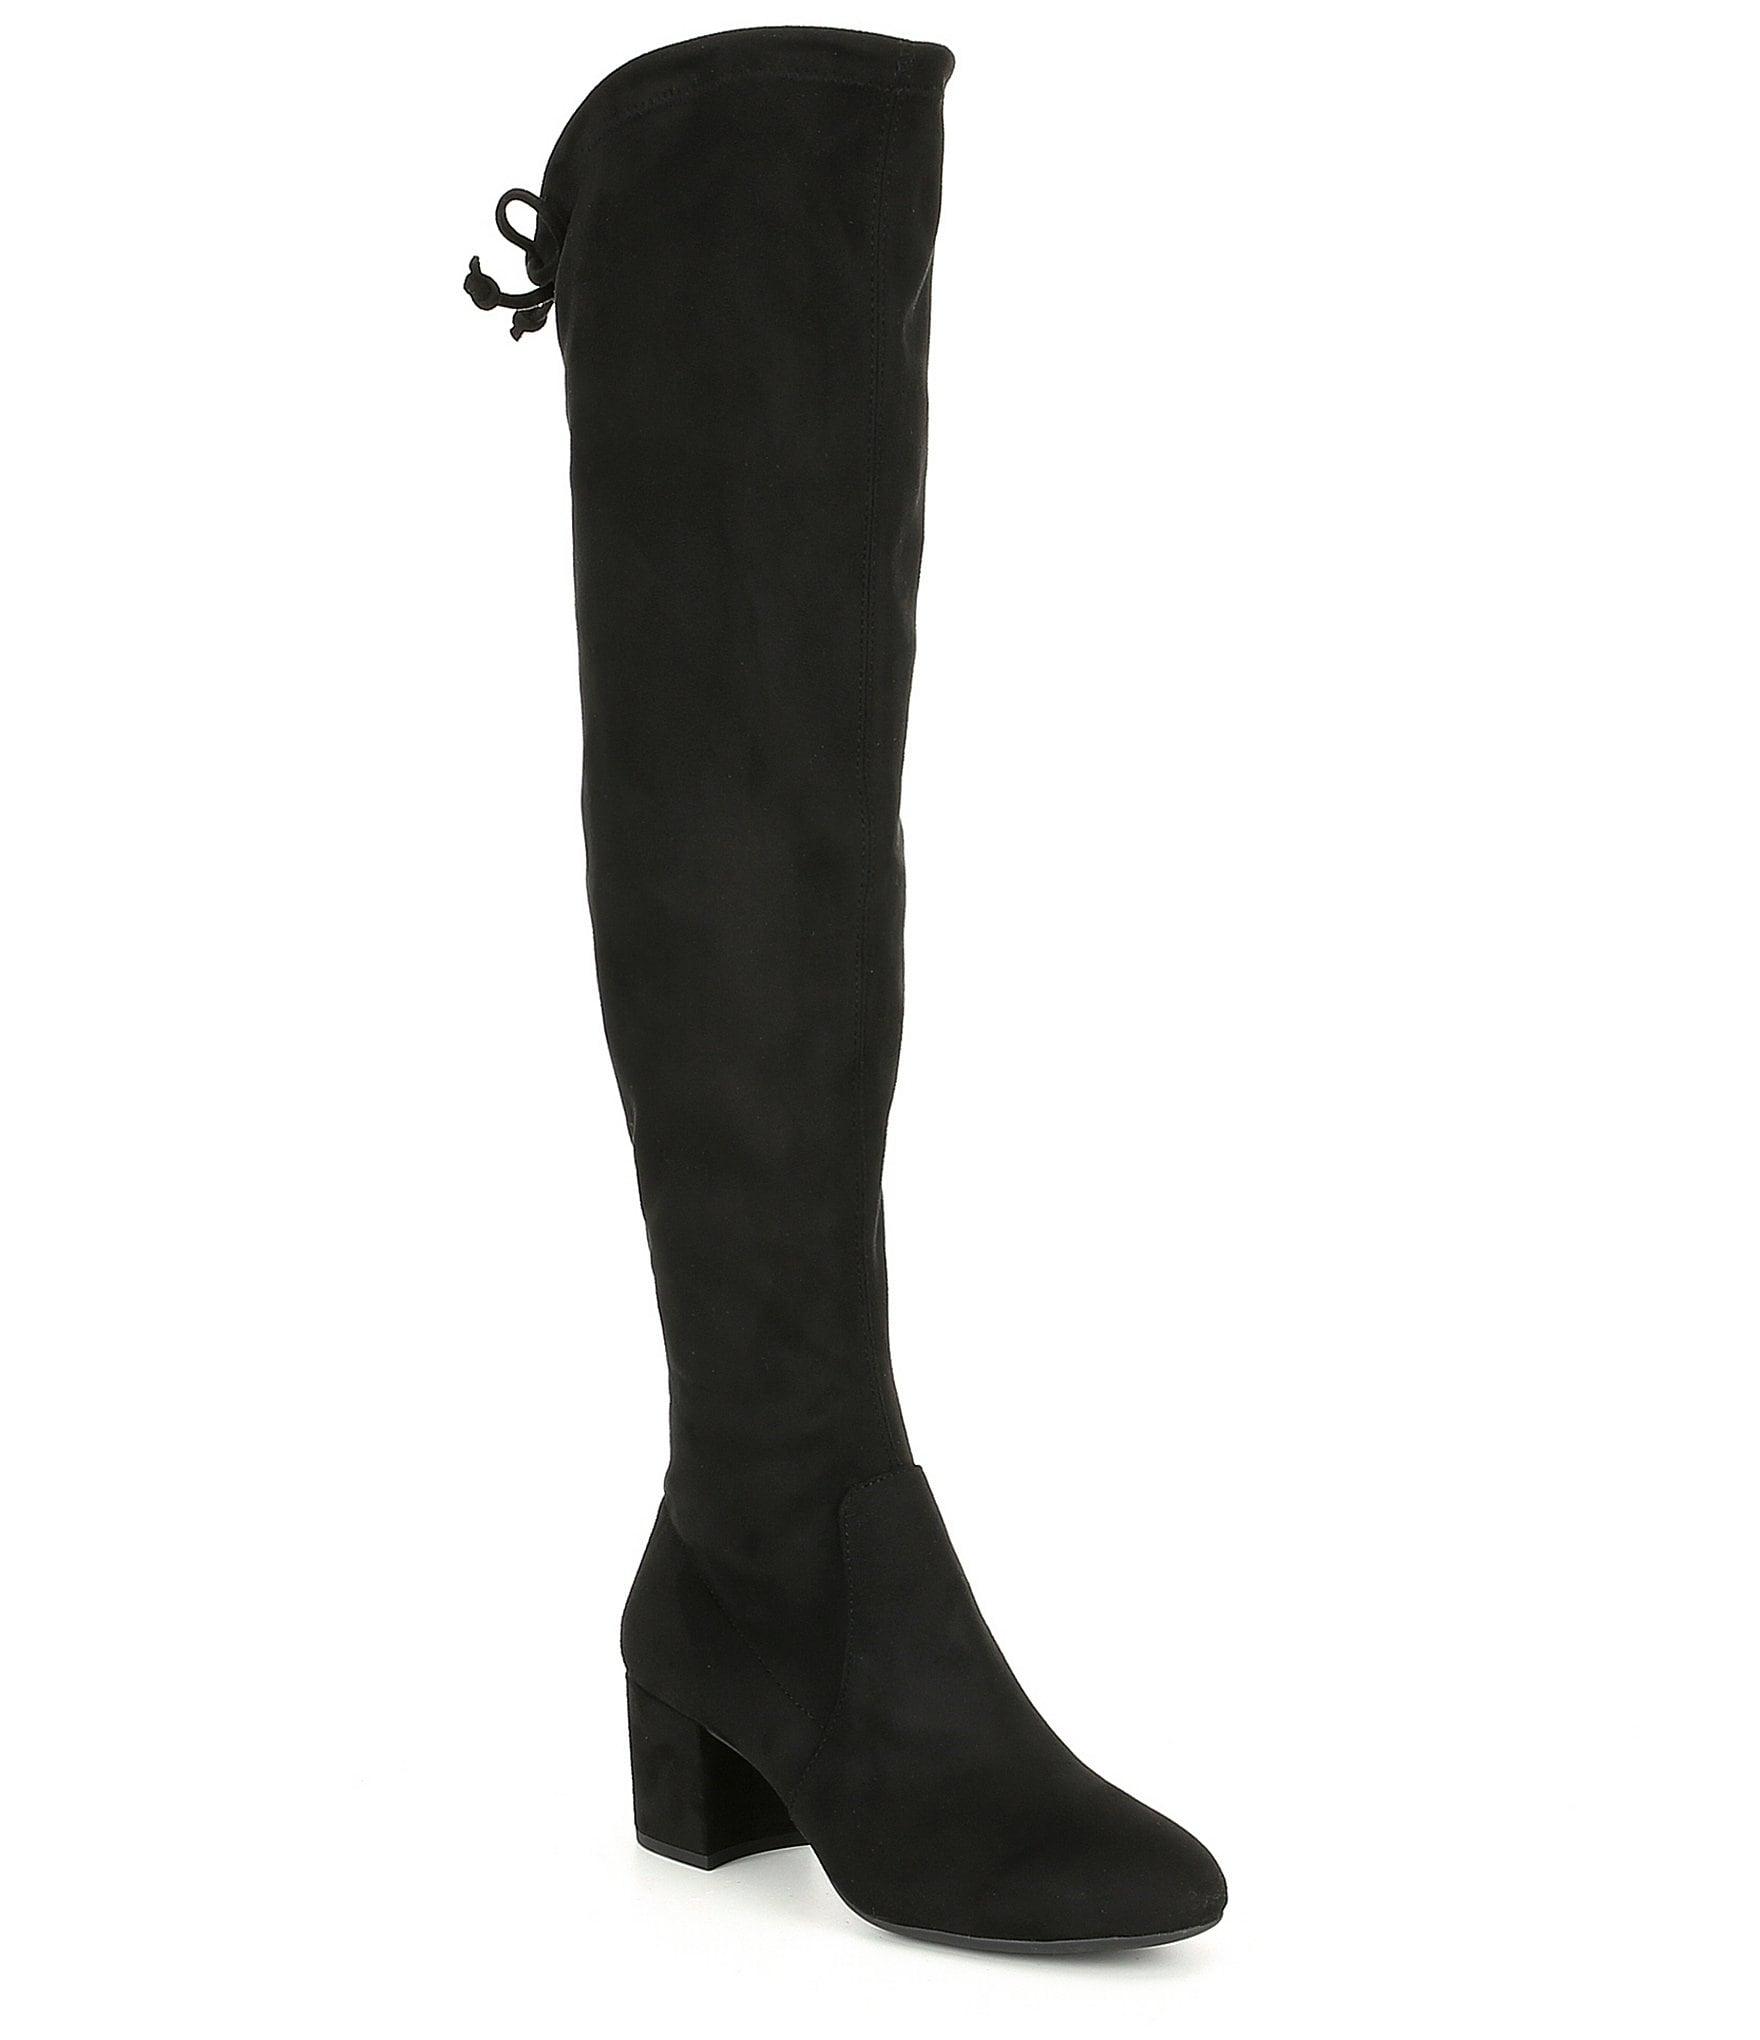 f2f3b2e9c5d Gianni Bini Trillia Block Heel Stretch Over The Knee Boots